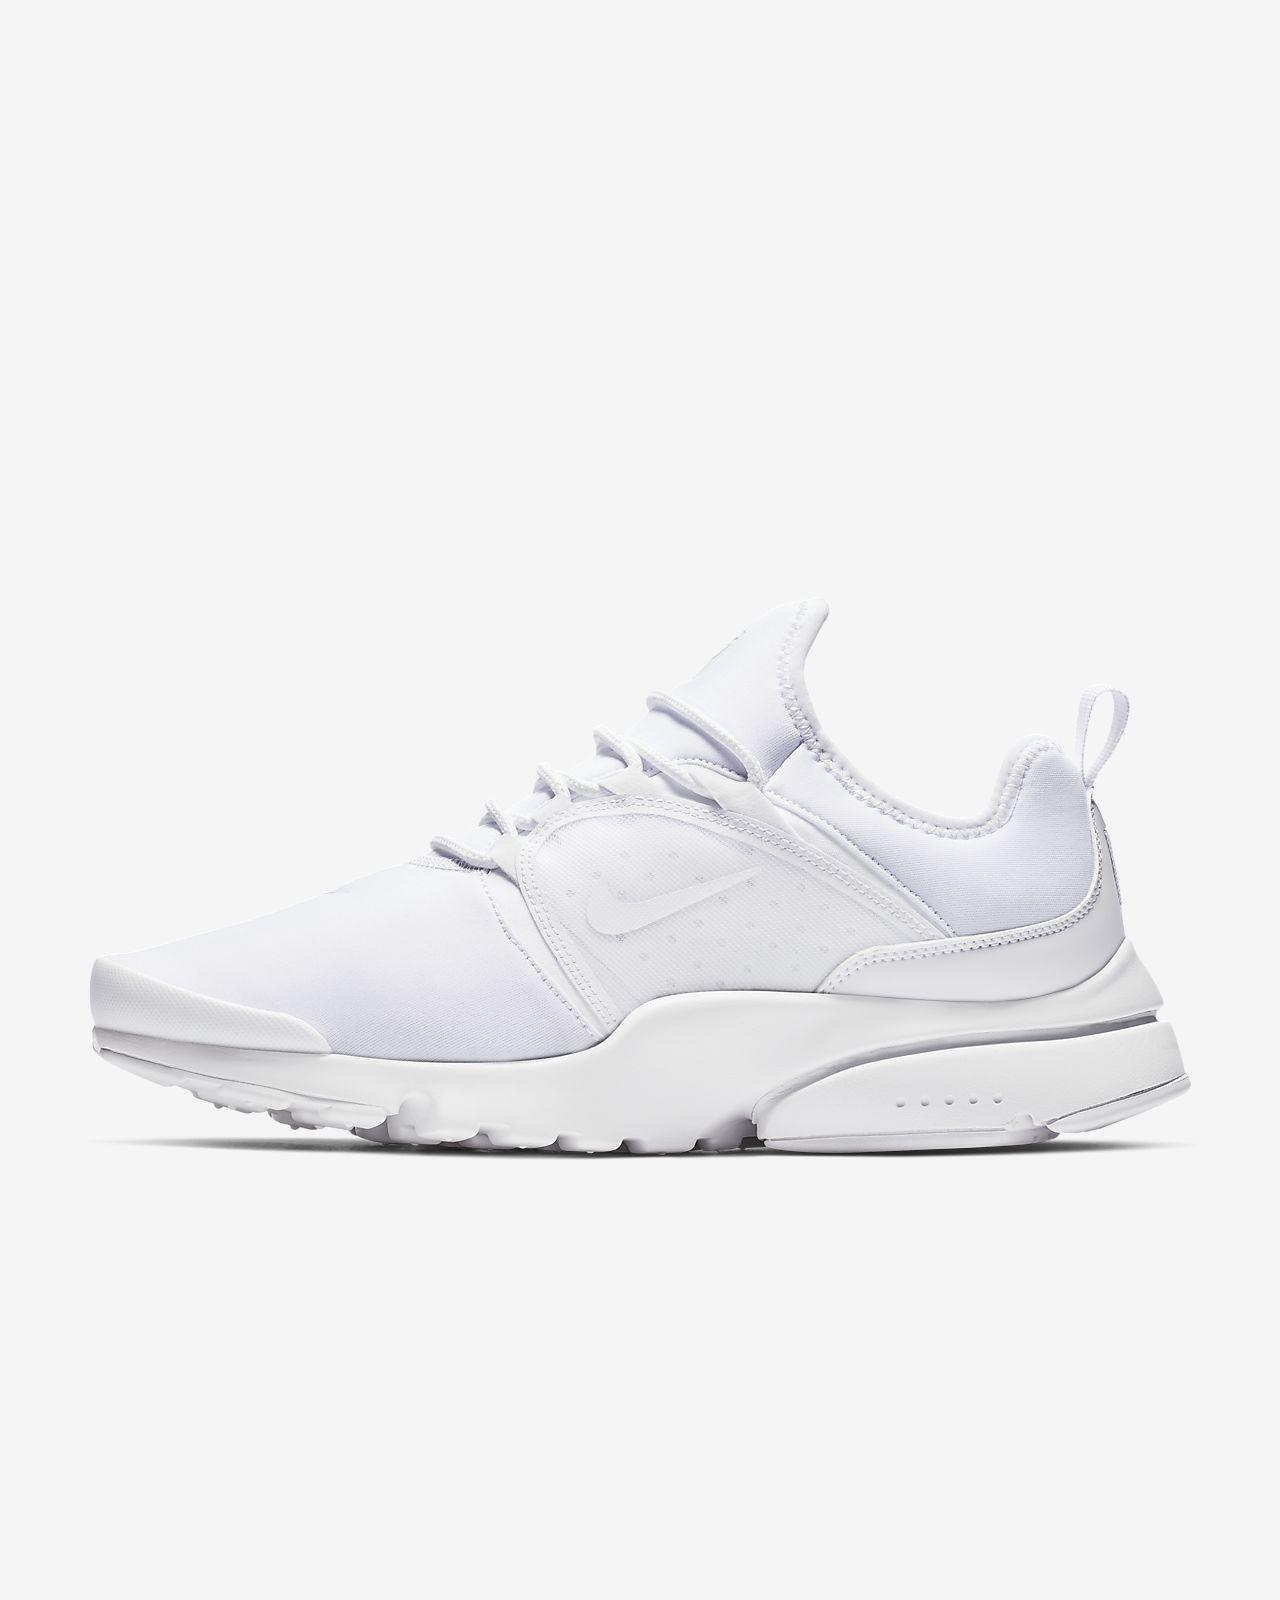 Nike Presto Fly World Men's Shoe